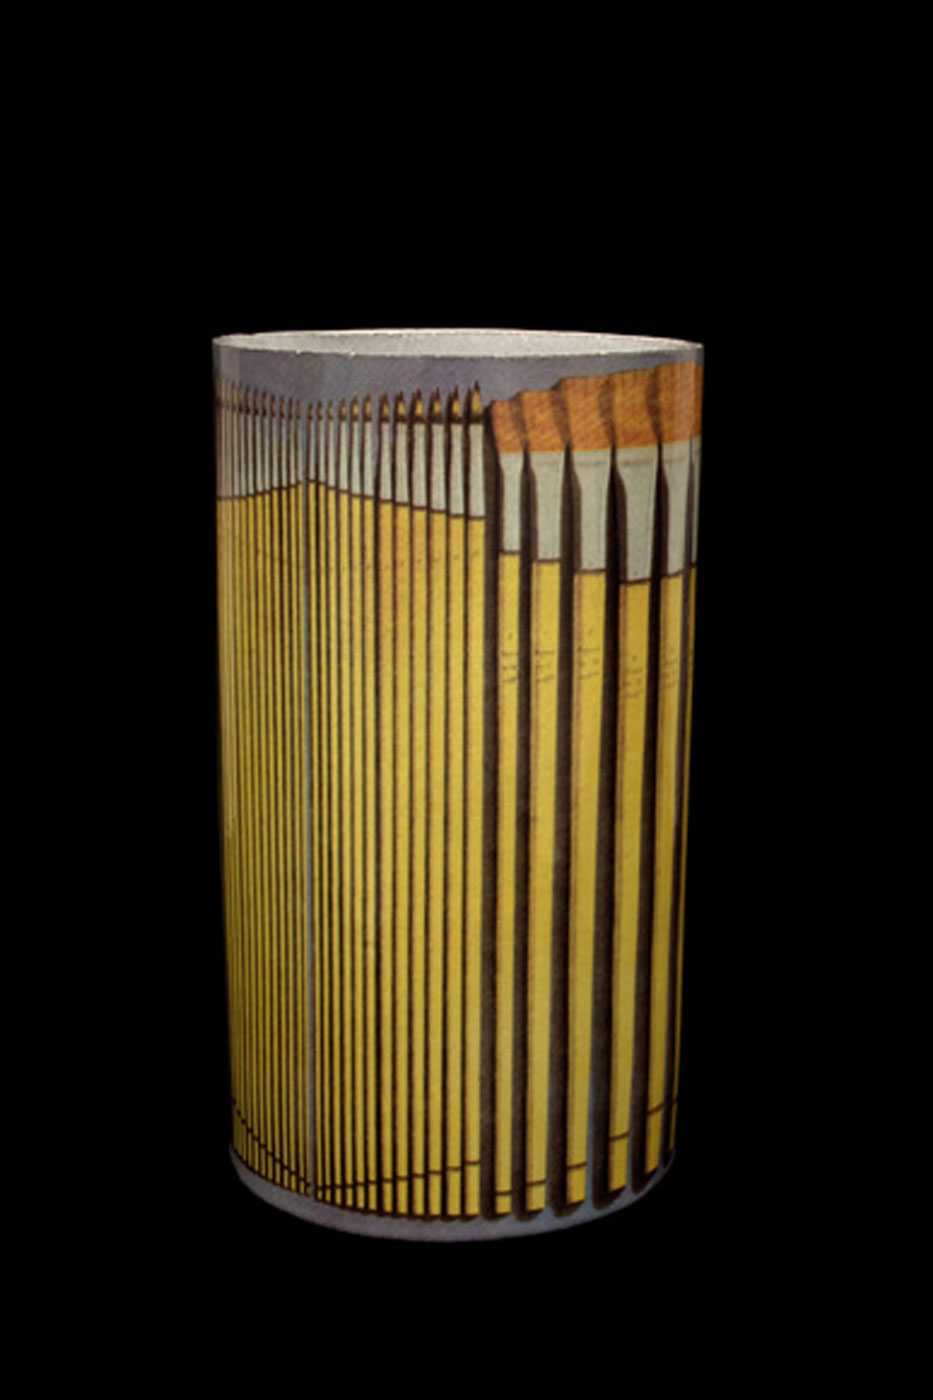 Vas John Derian Paintbrushes